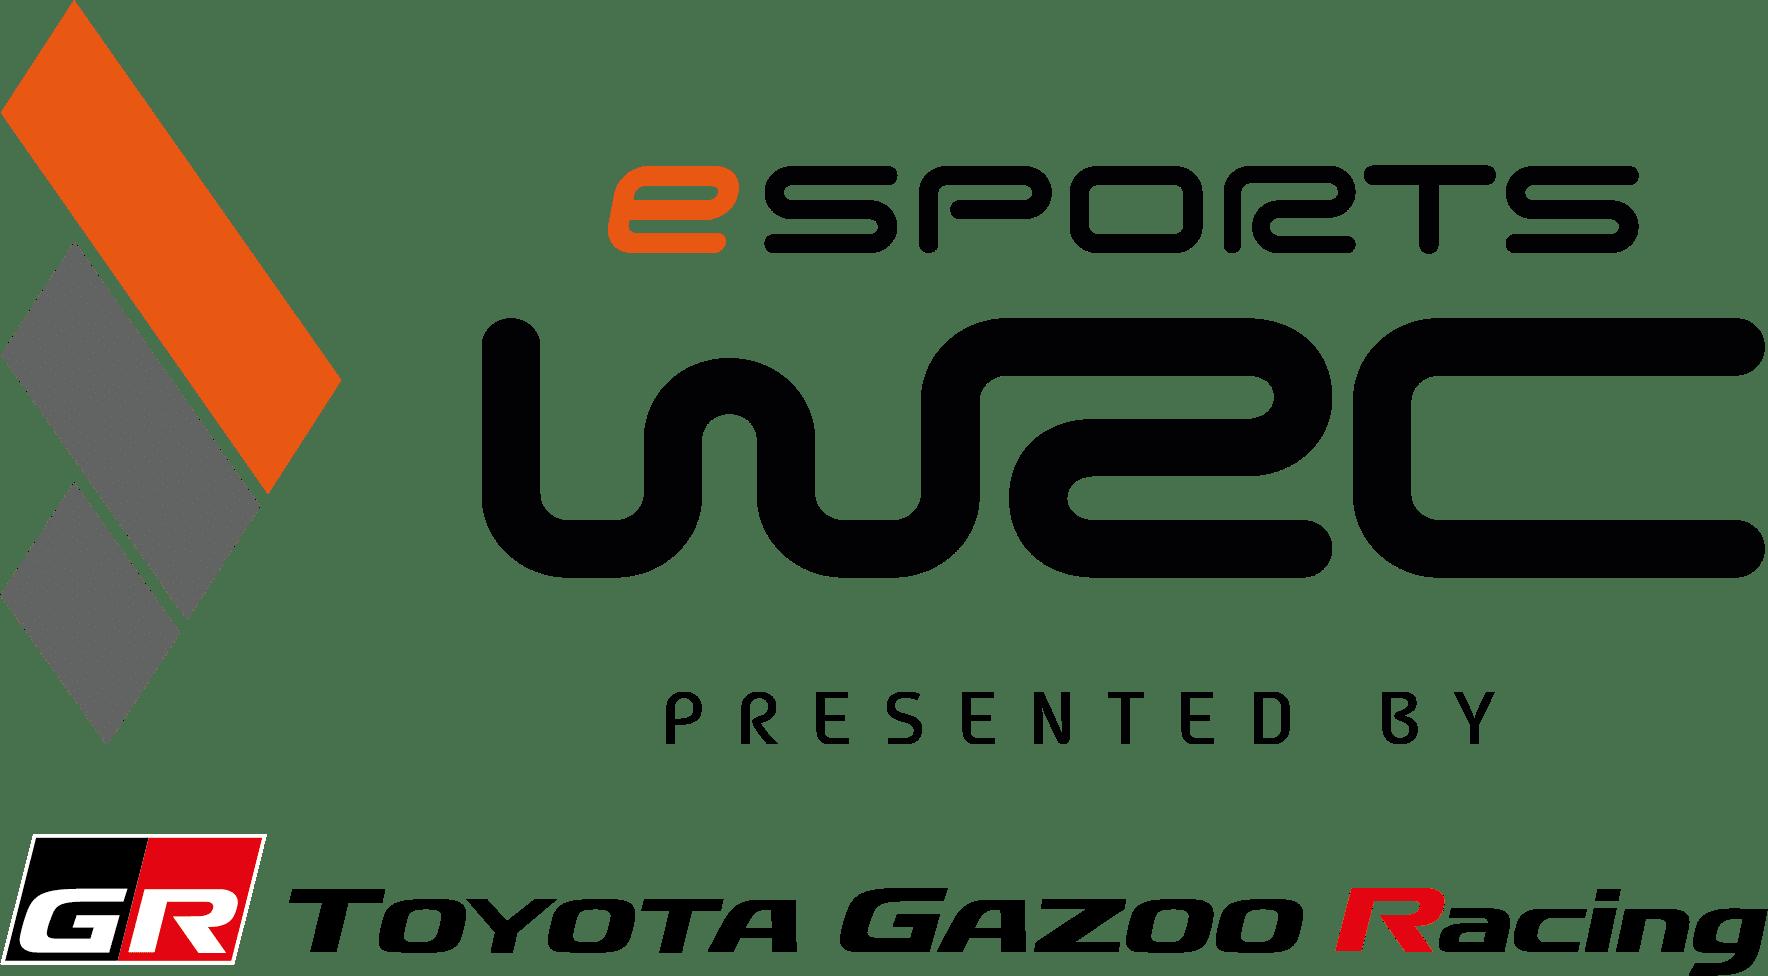 eSport: al via le finali di WRC presentate da TOYOTA GAZOO Racing thumbnail